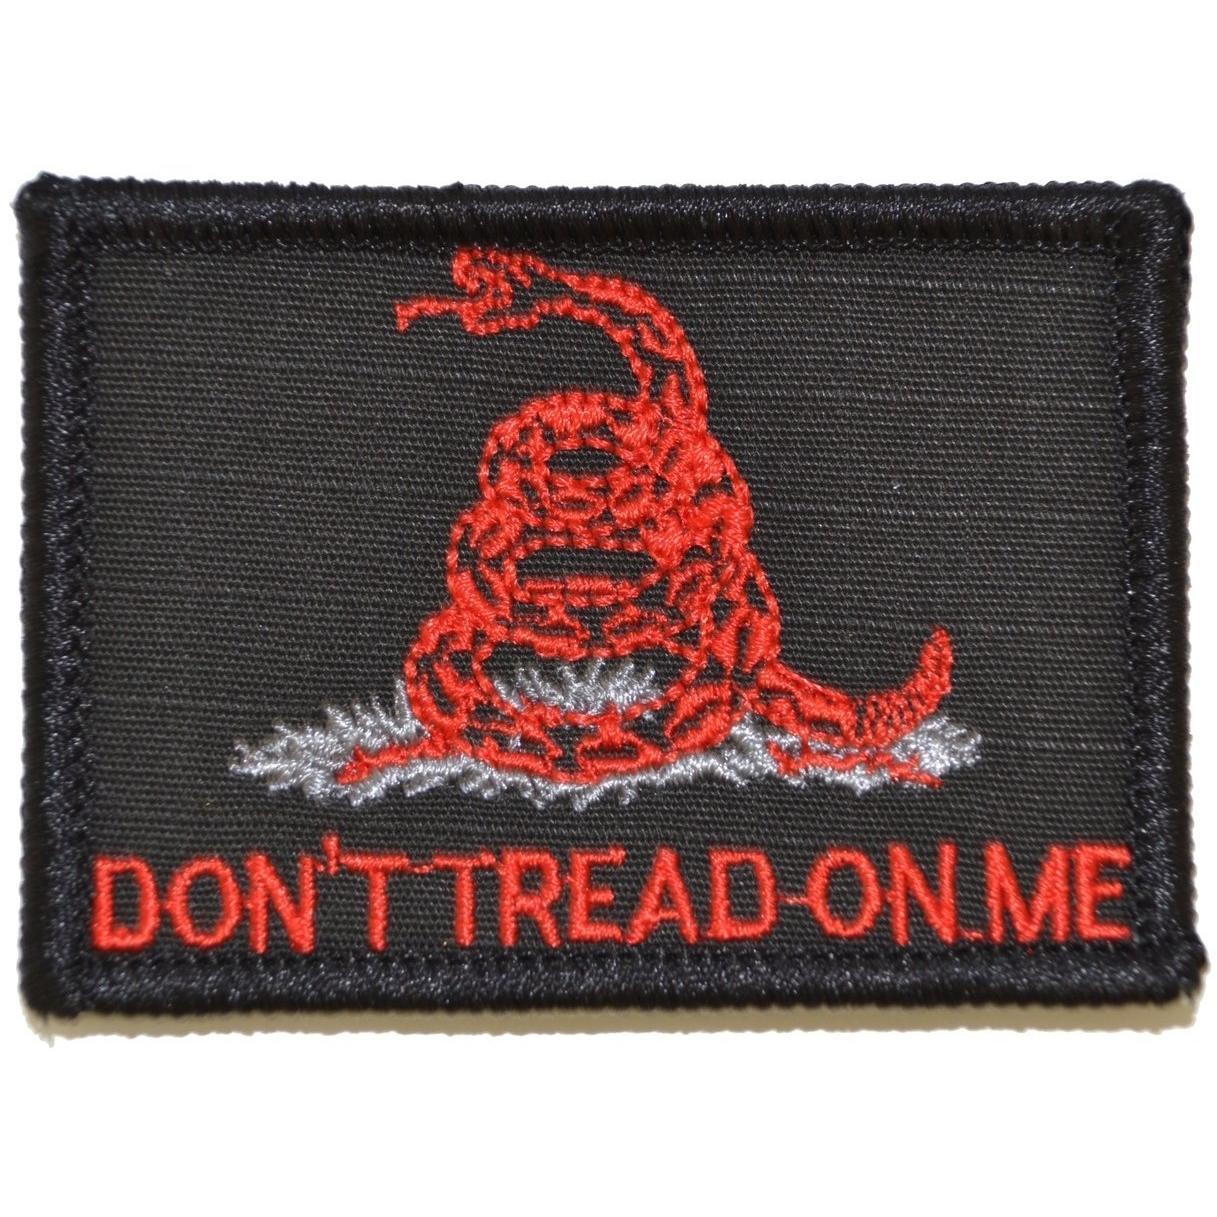 Don't Tread on Me Gadsden Snake - 2x3 Patch